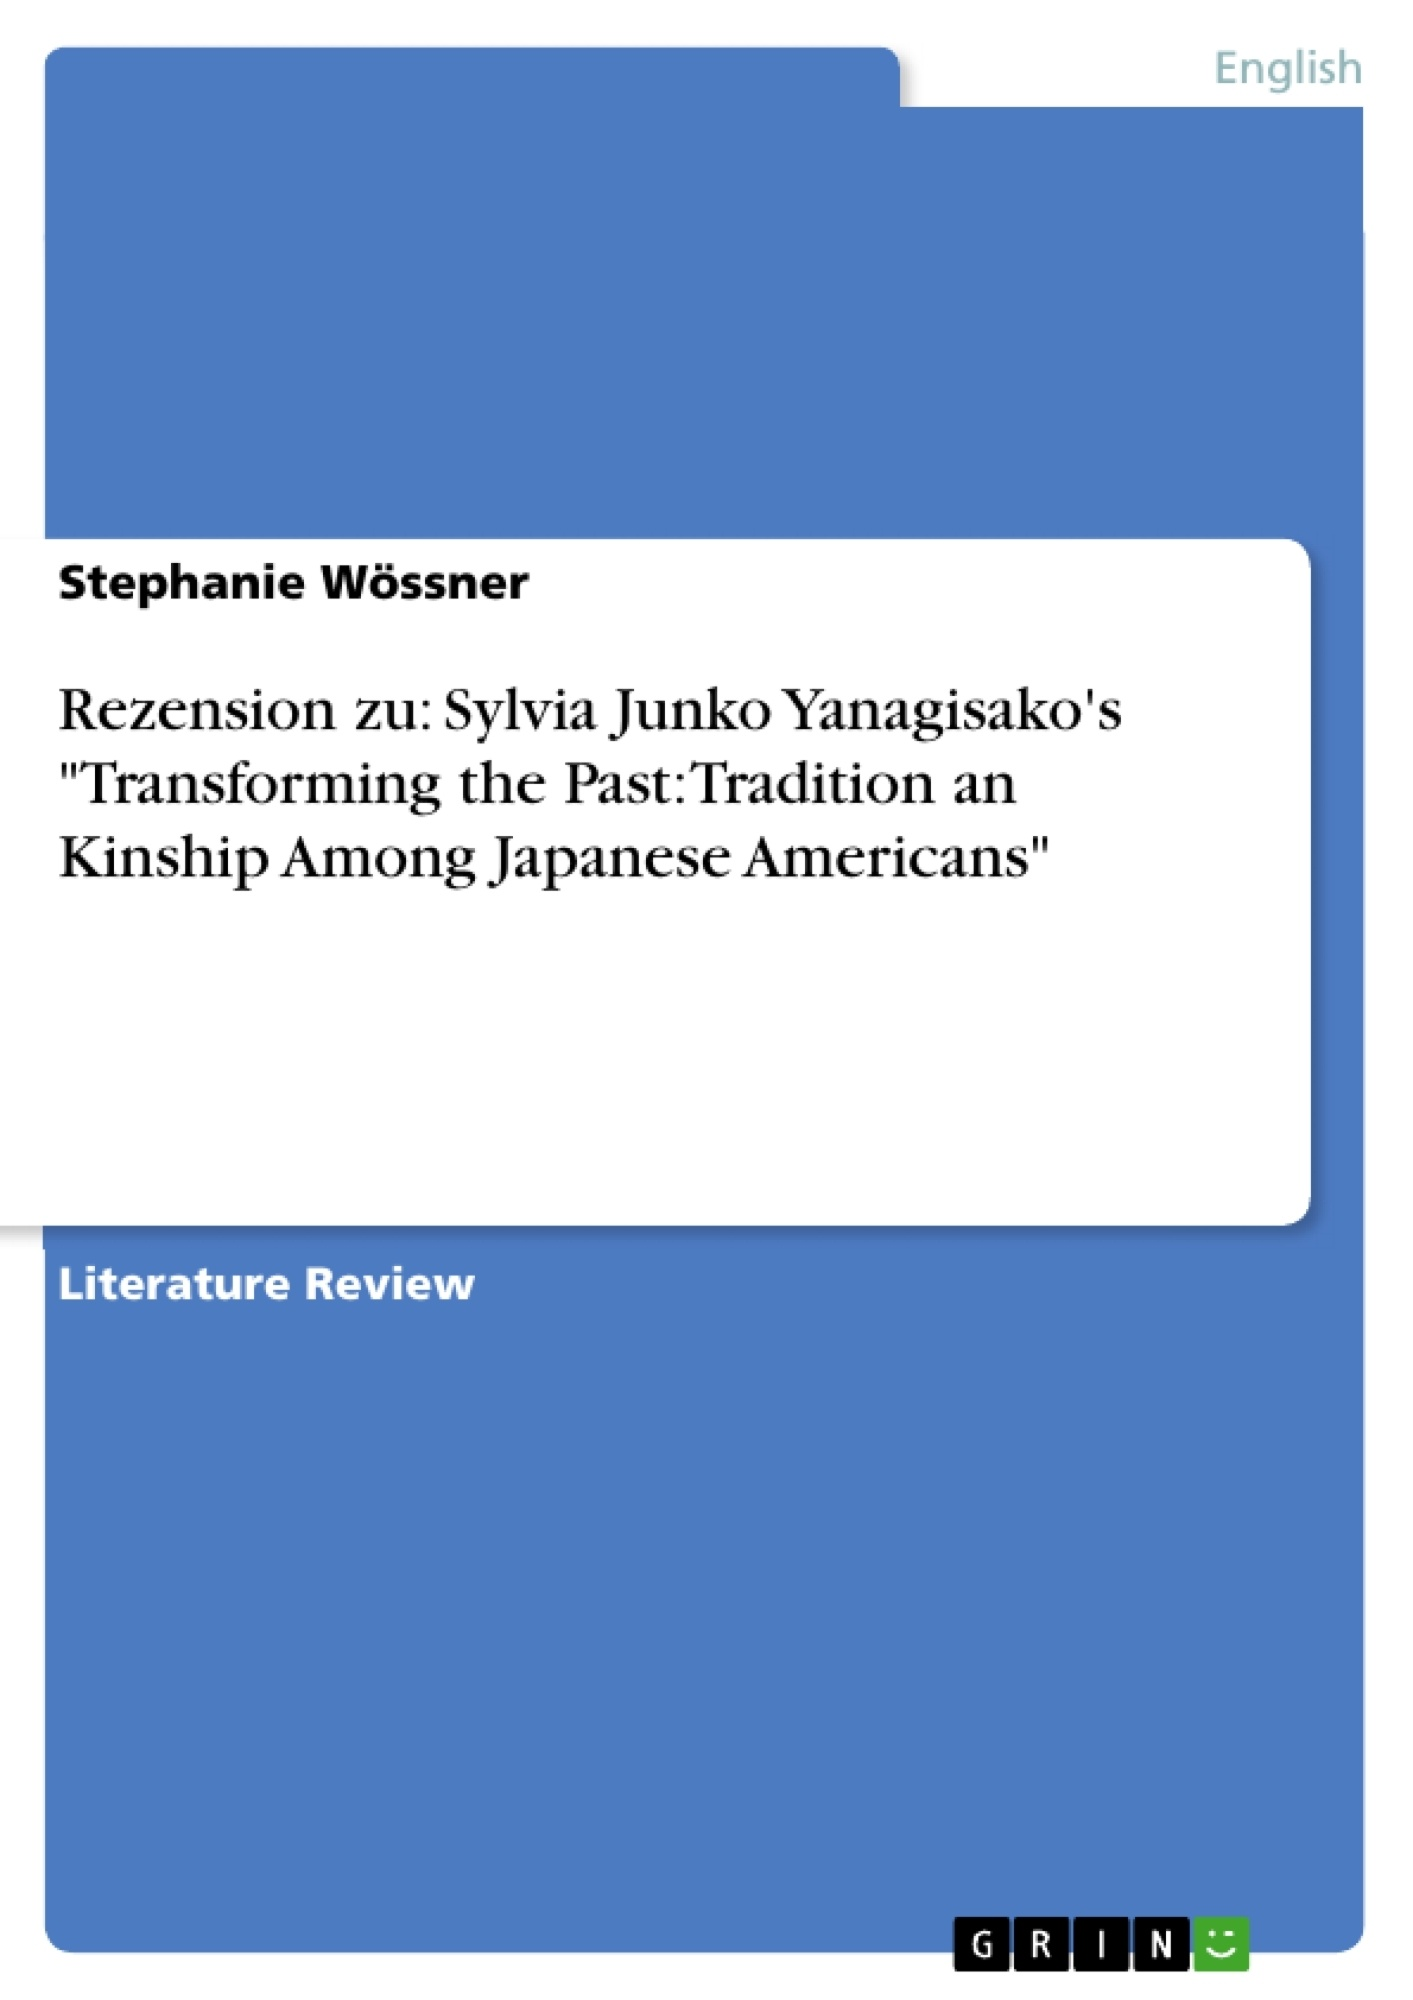 "Title: Rezension zu: Sylvia Junko Yanagisako's ""Transforming the Past: Tradition an Kinship Among Japanese Americans"""